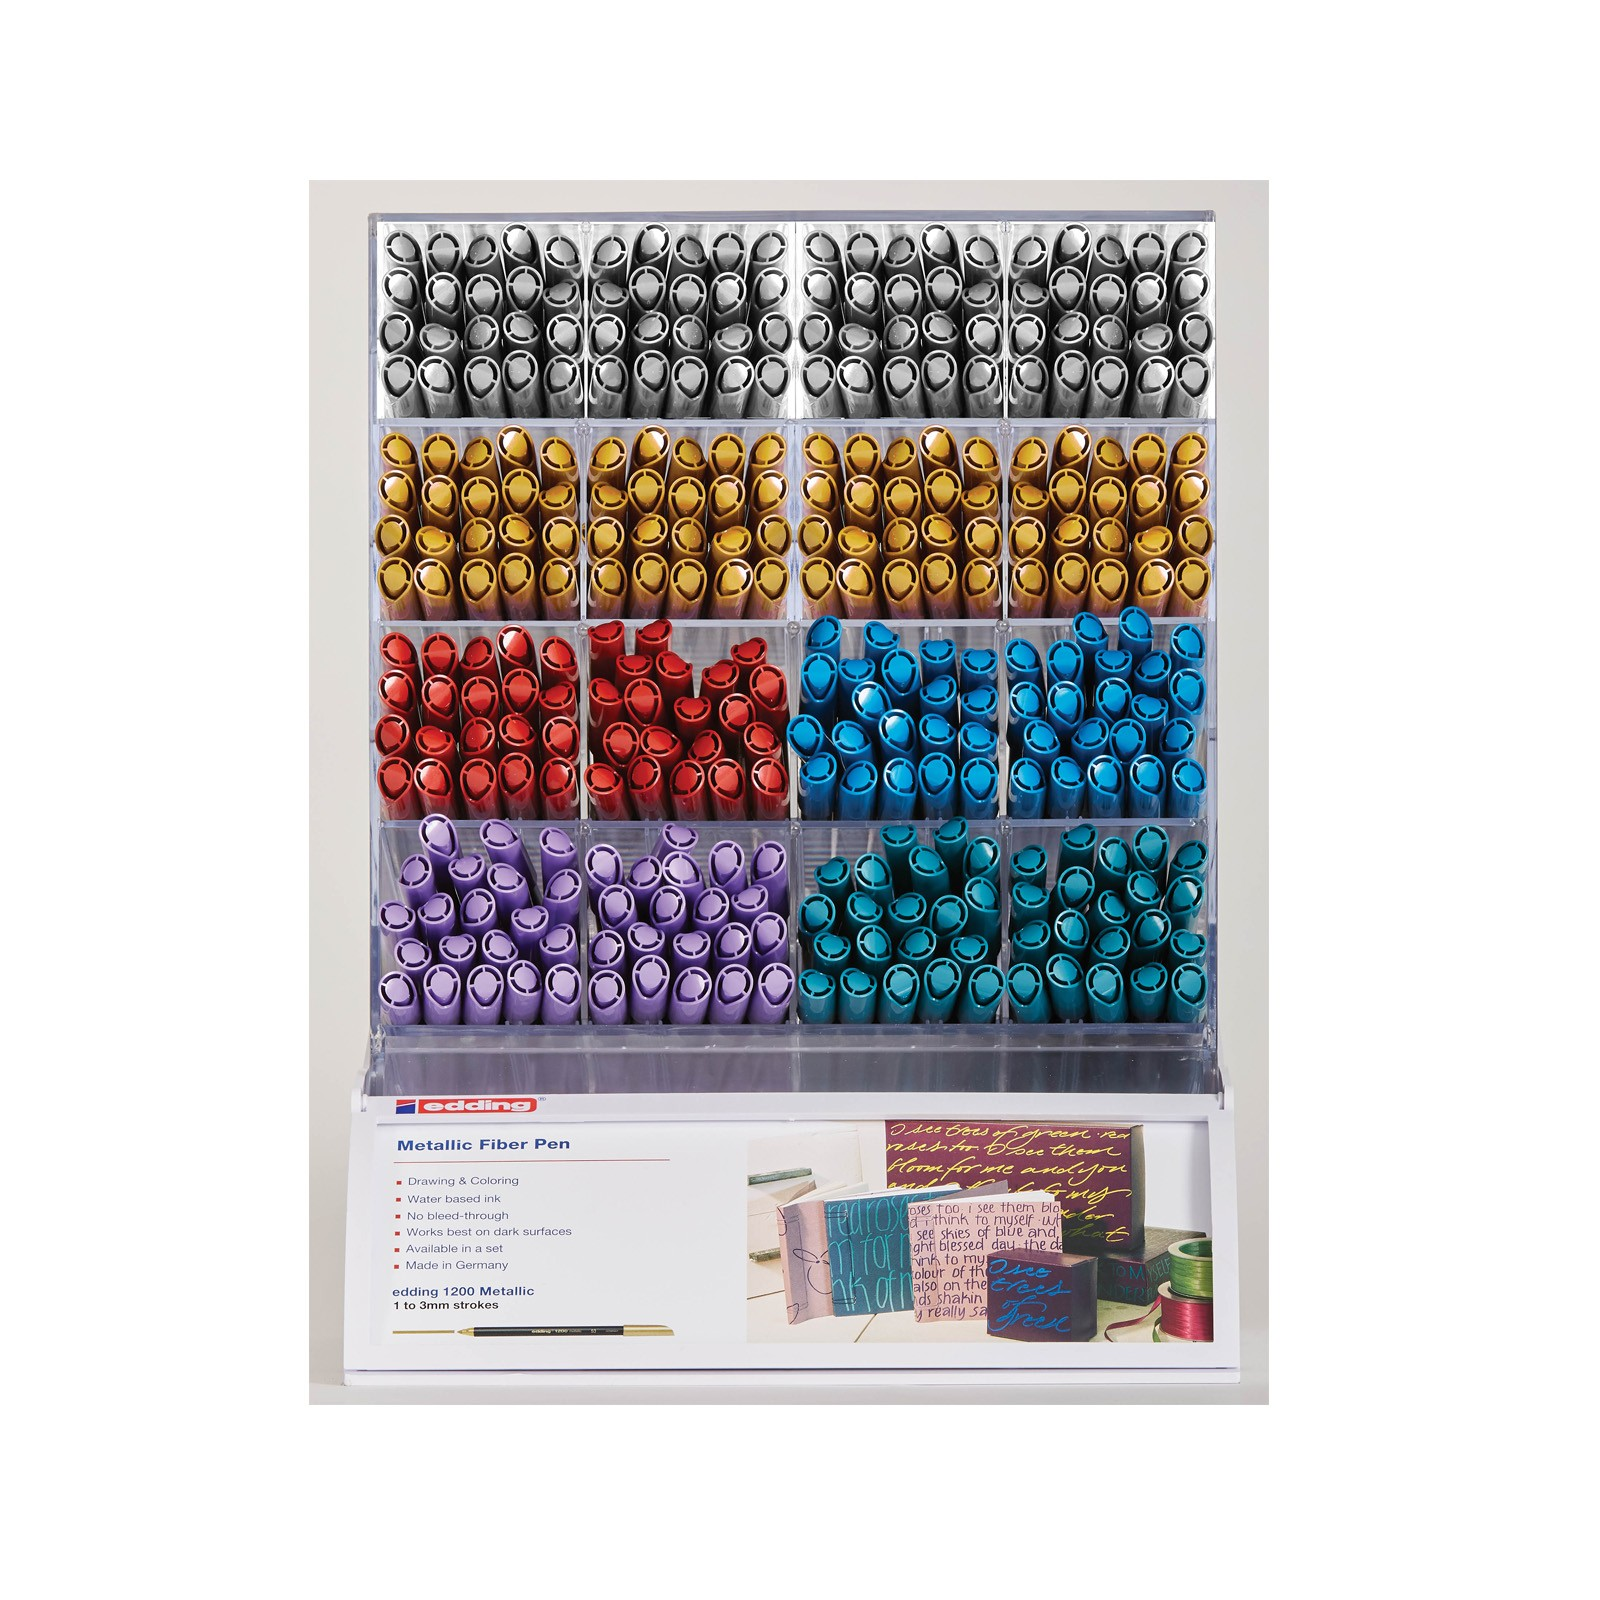 1200 Metallic Fiber Pen display module